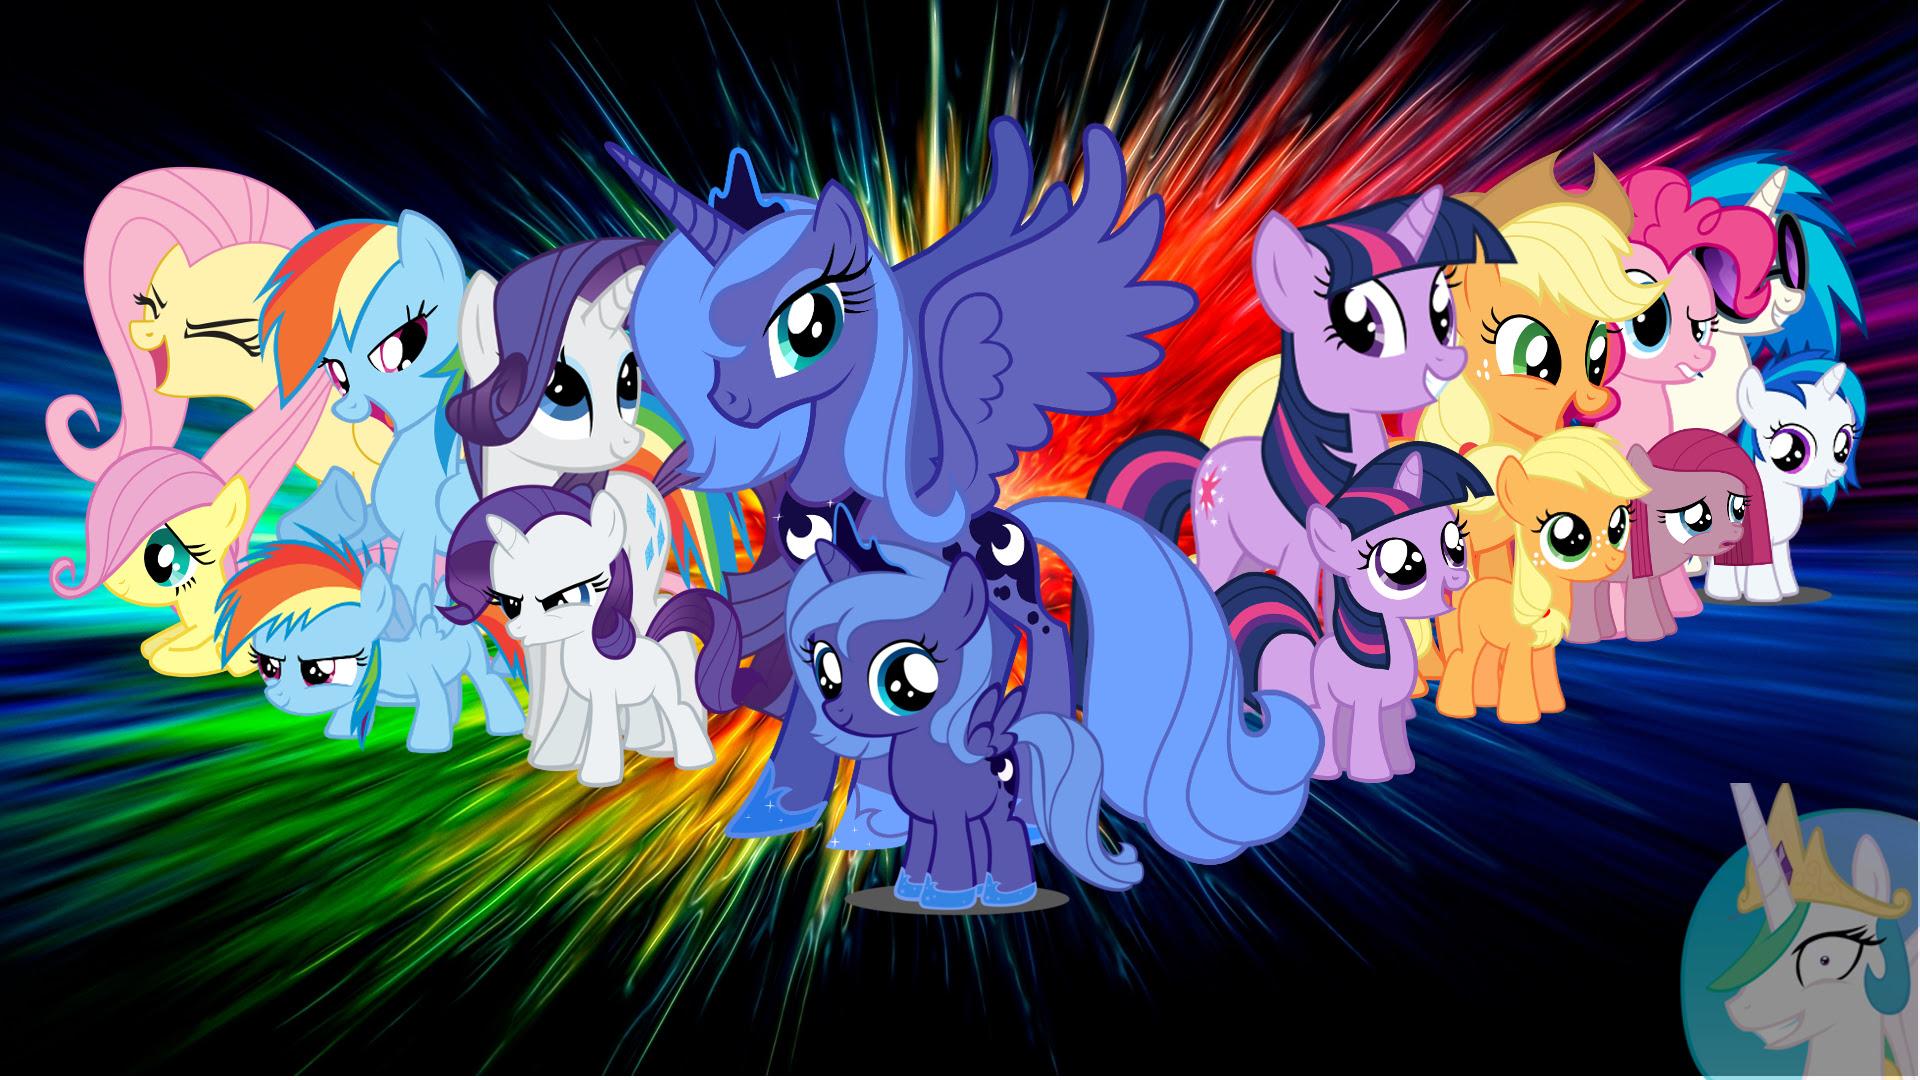 Beautiful My Little Pony Wallpaper 1920x1080 18162